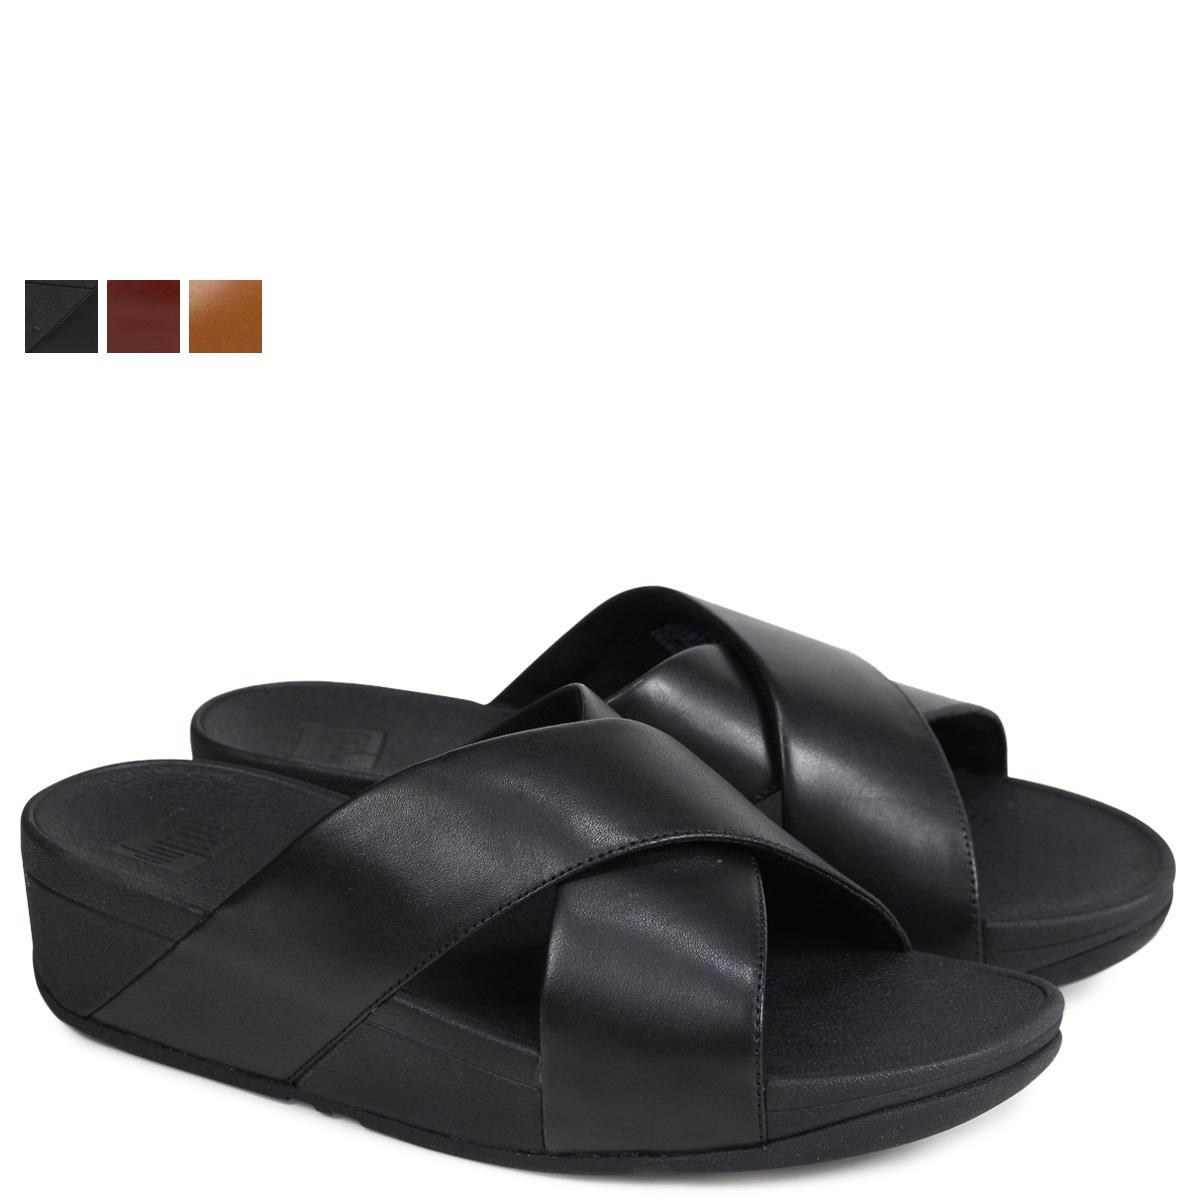 0ebc662a2 FitFlop LULU CROSS SLIDE SANDALS sandals fitting FLOP Lulu Lady s K04 black  brown  4 4 Shinnyu load